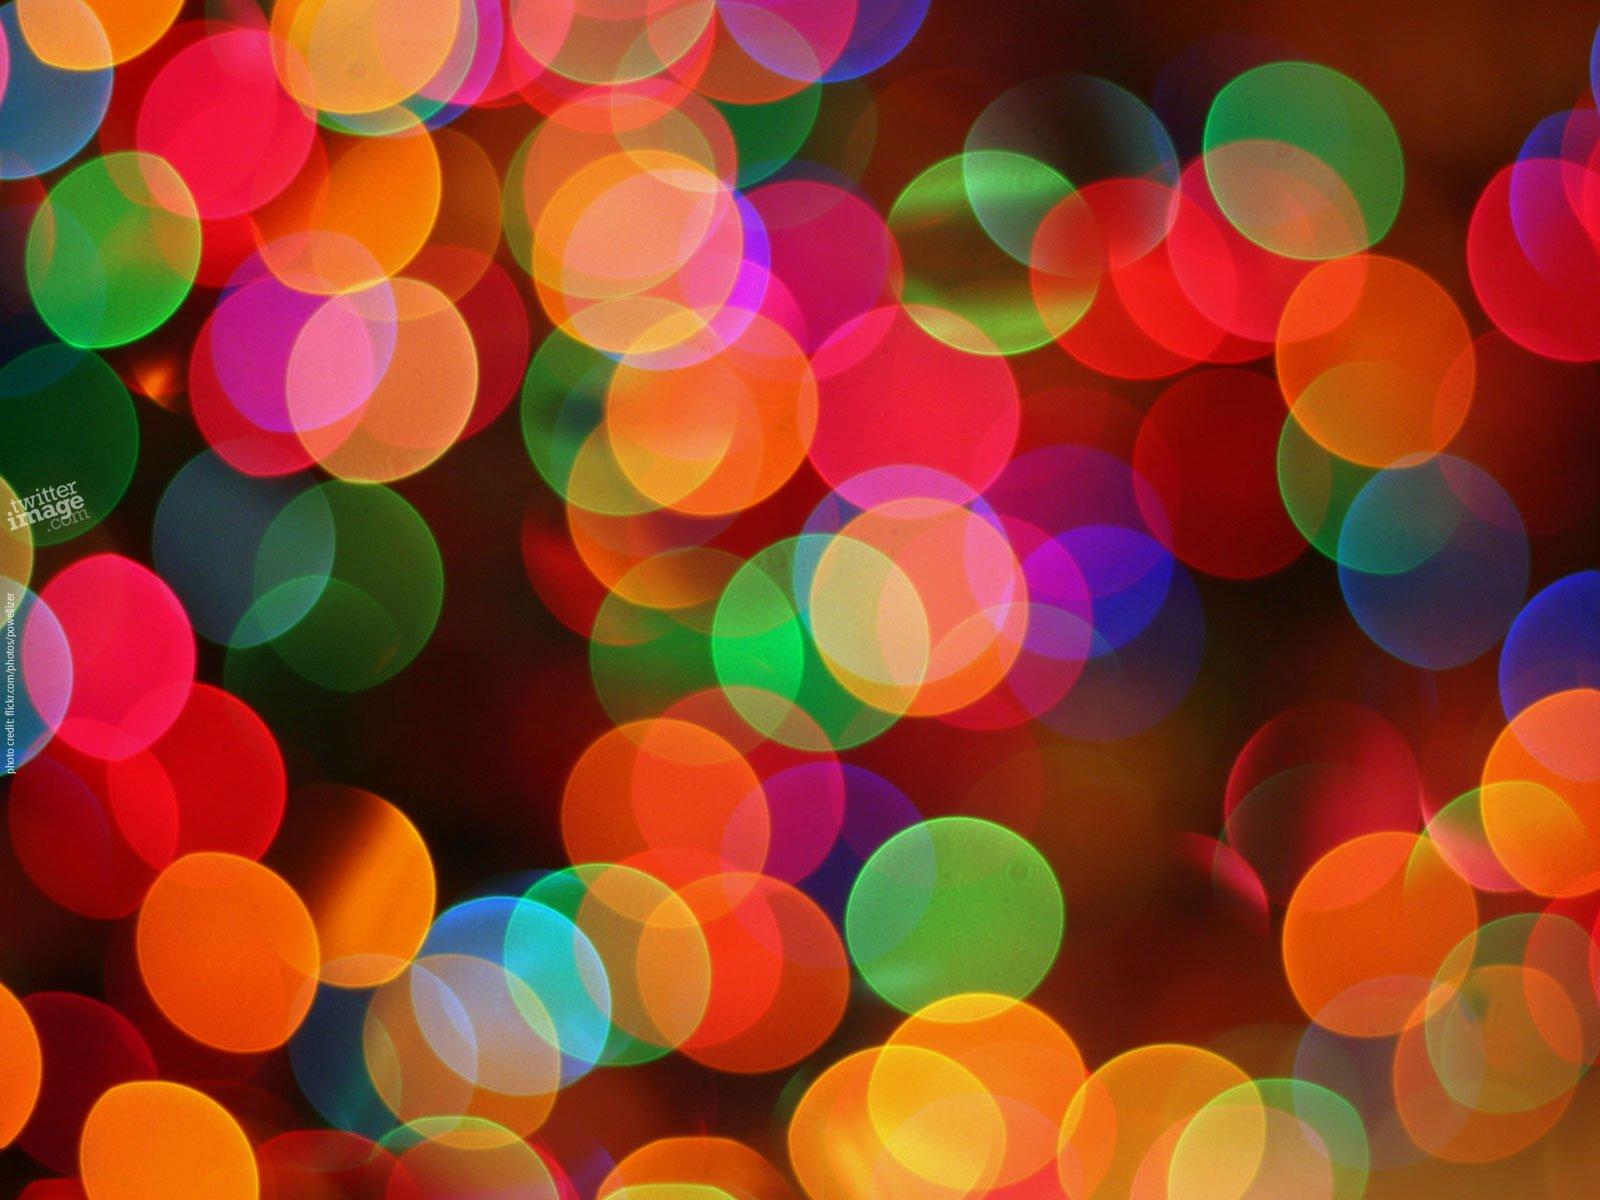 circulos coloridos Lindas Fotos e Imagens Coloridas   Cores do Arco Íris e Objetos, Flor